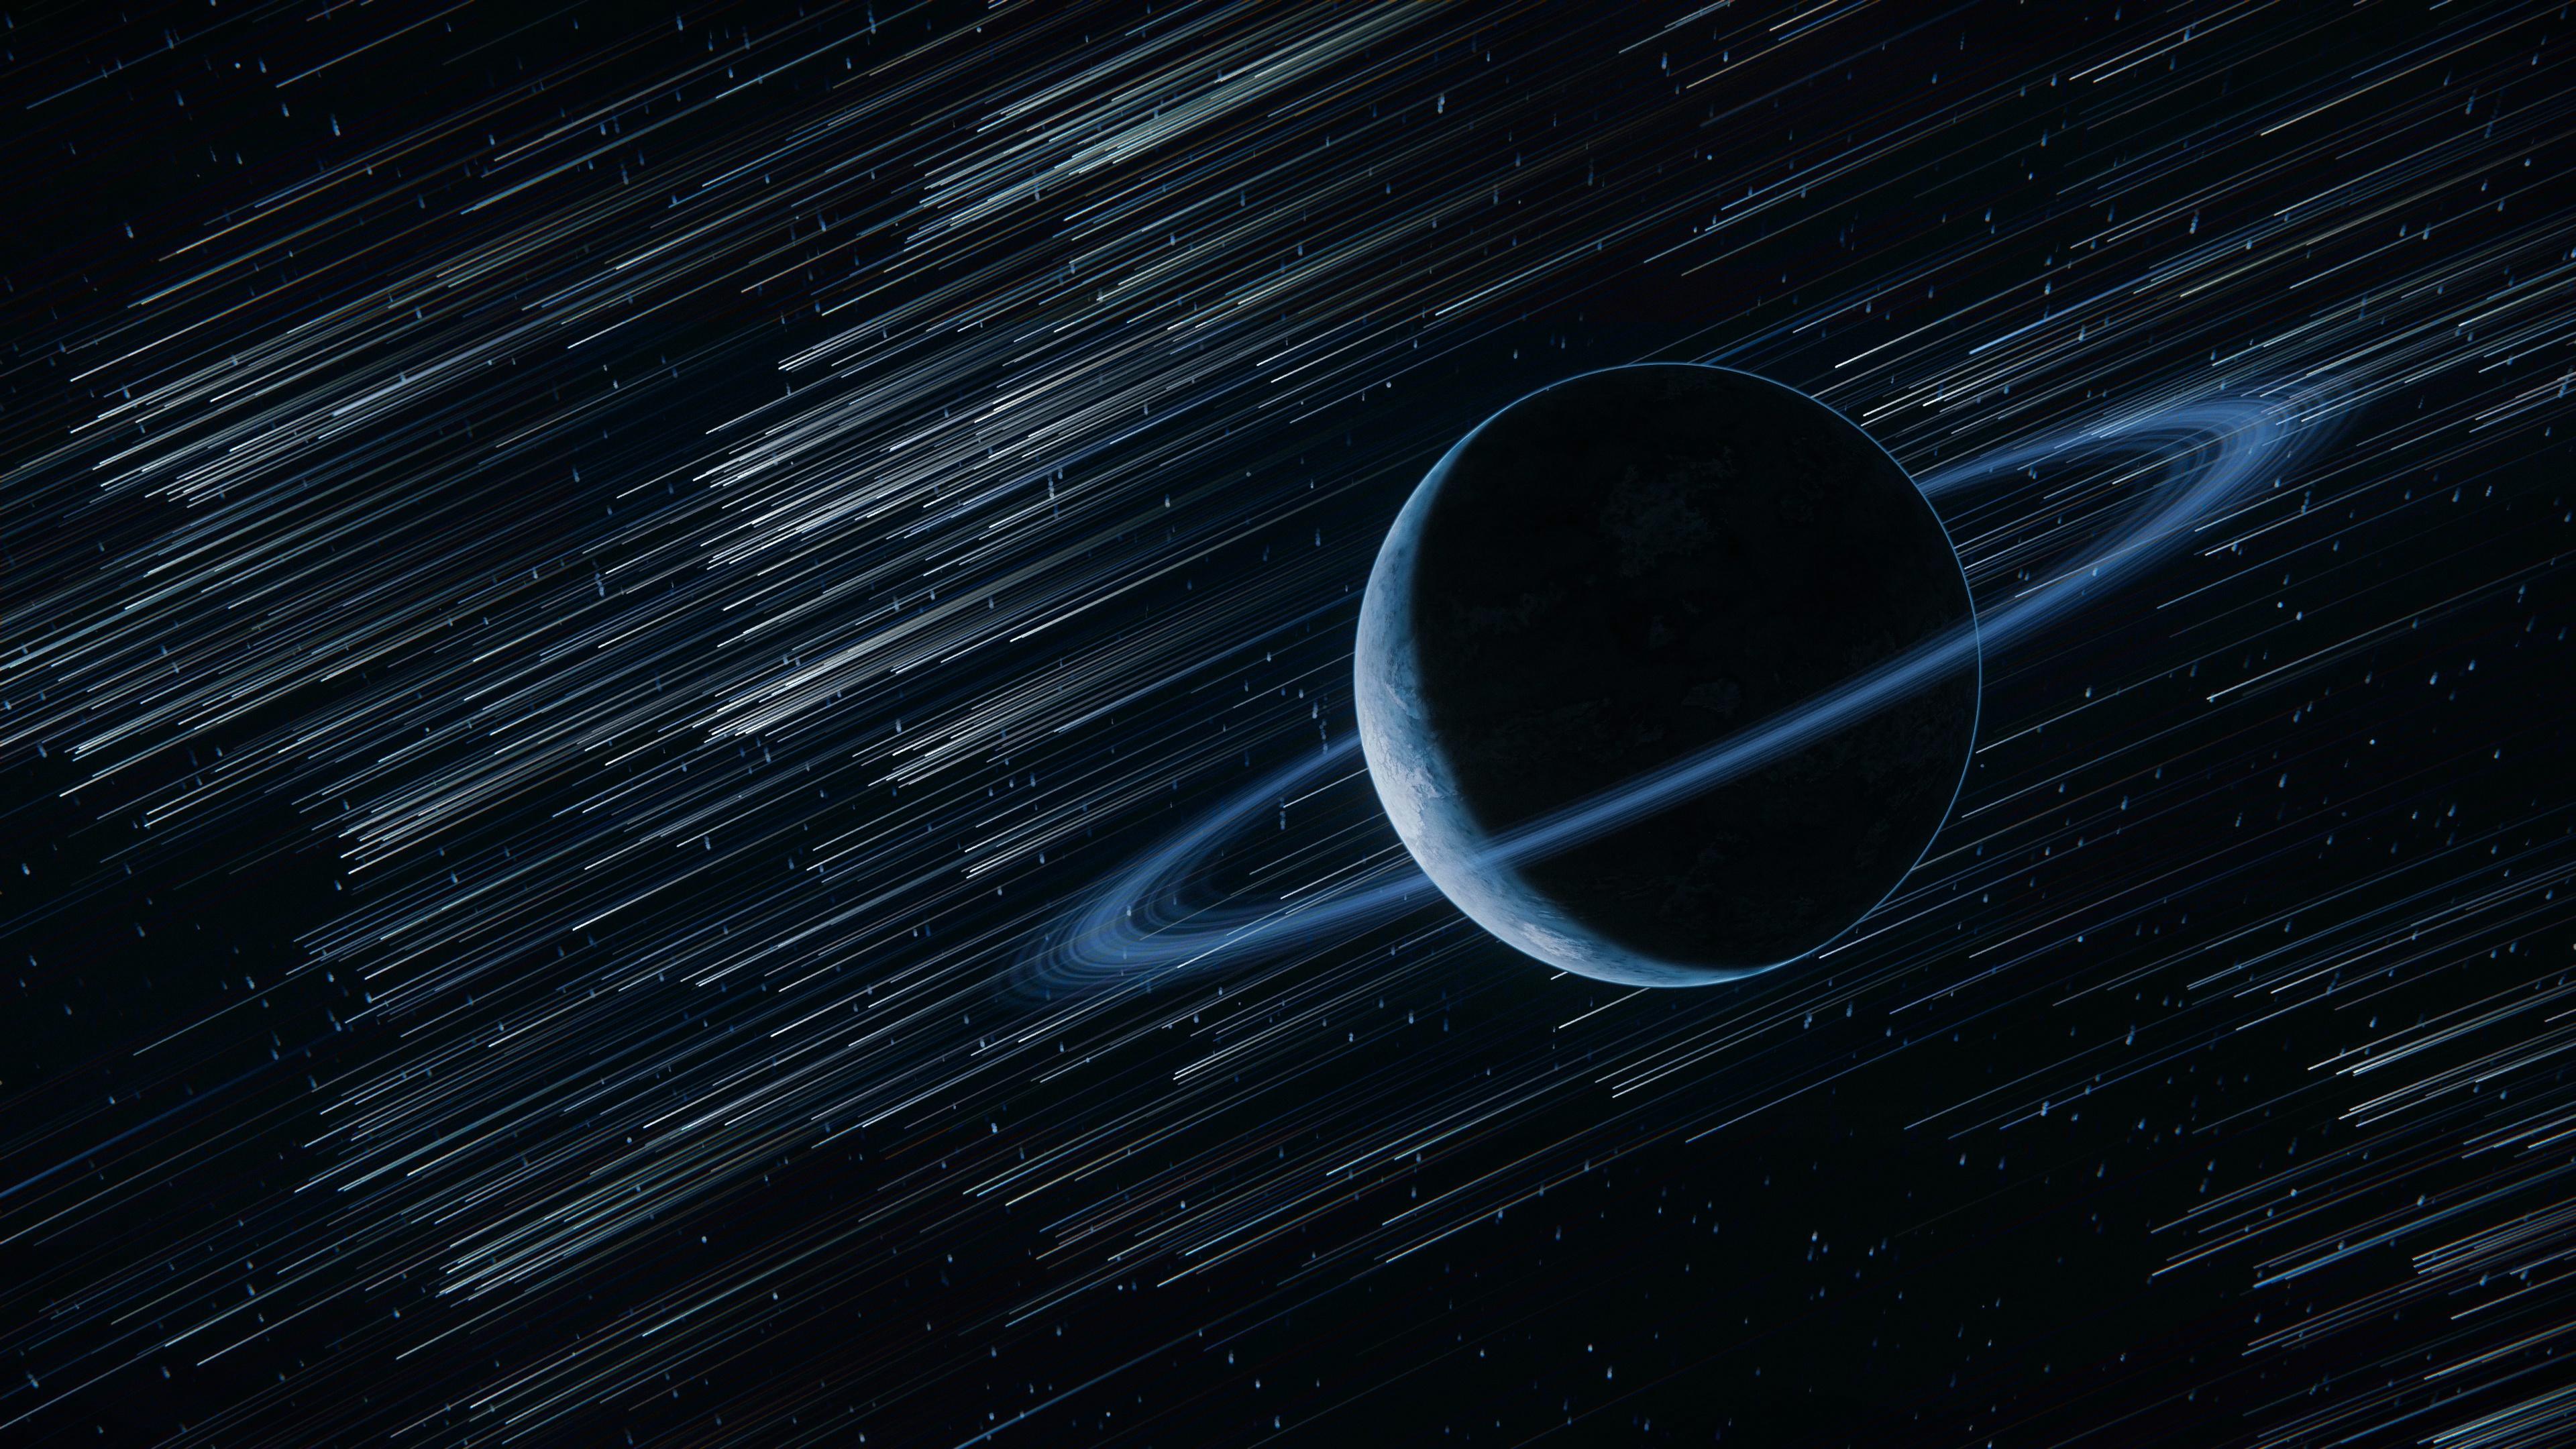 saturn 1574943224 - Saturn -